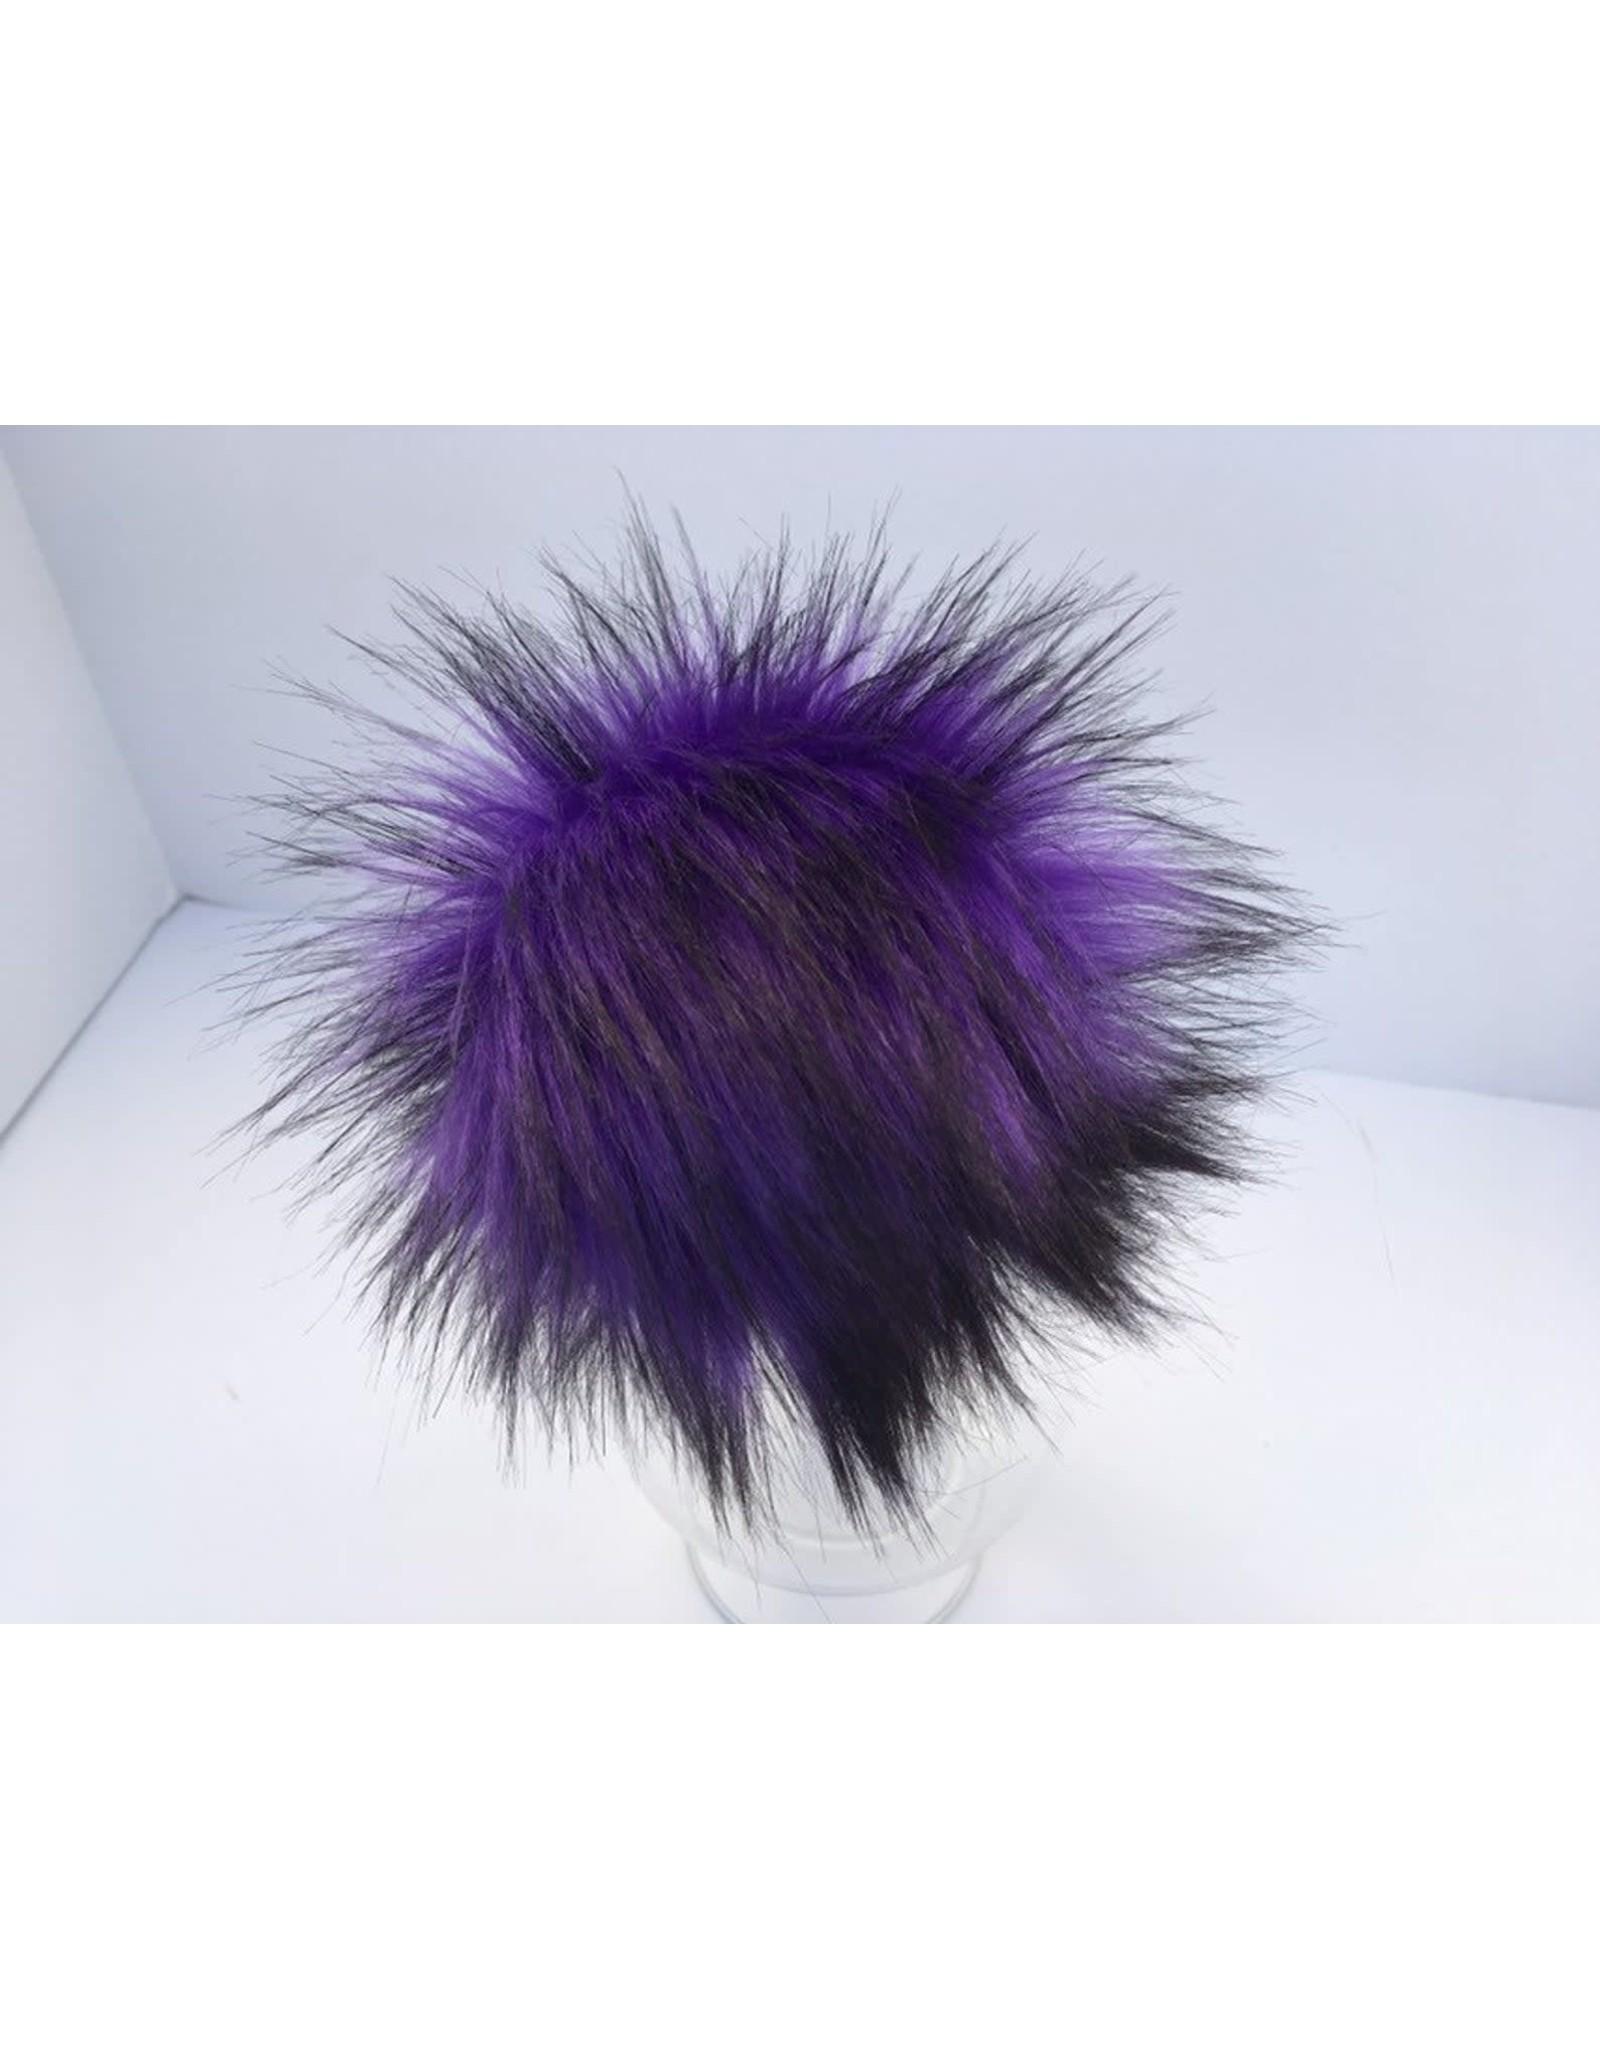 Faux Fur Pom Pom - Brights - Plum Faerie